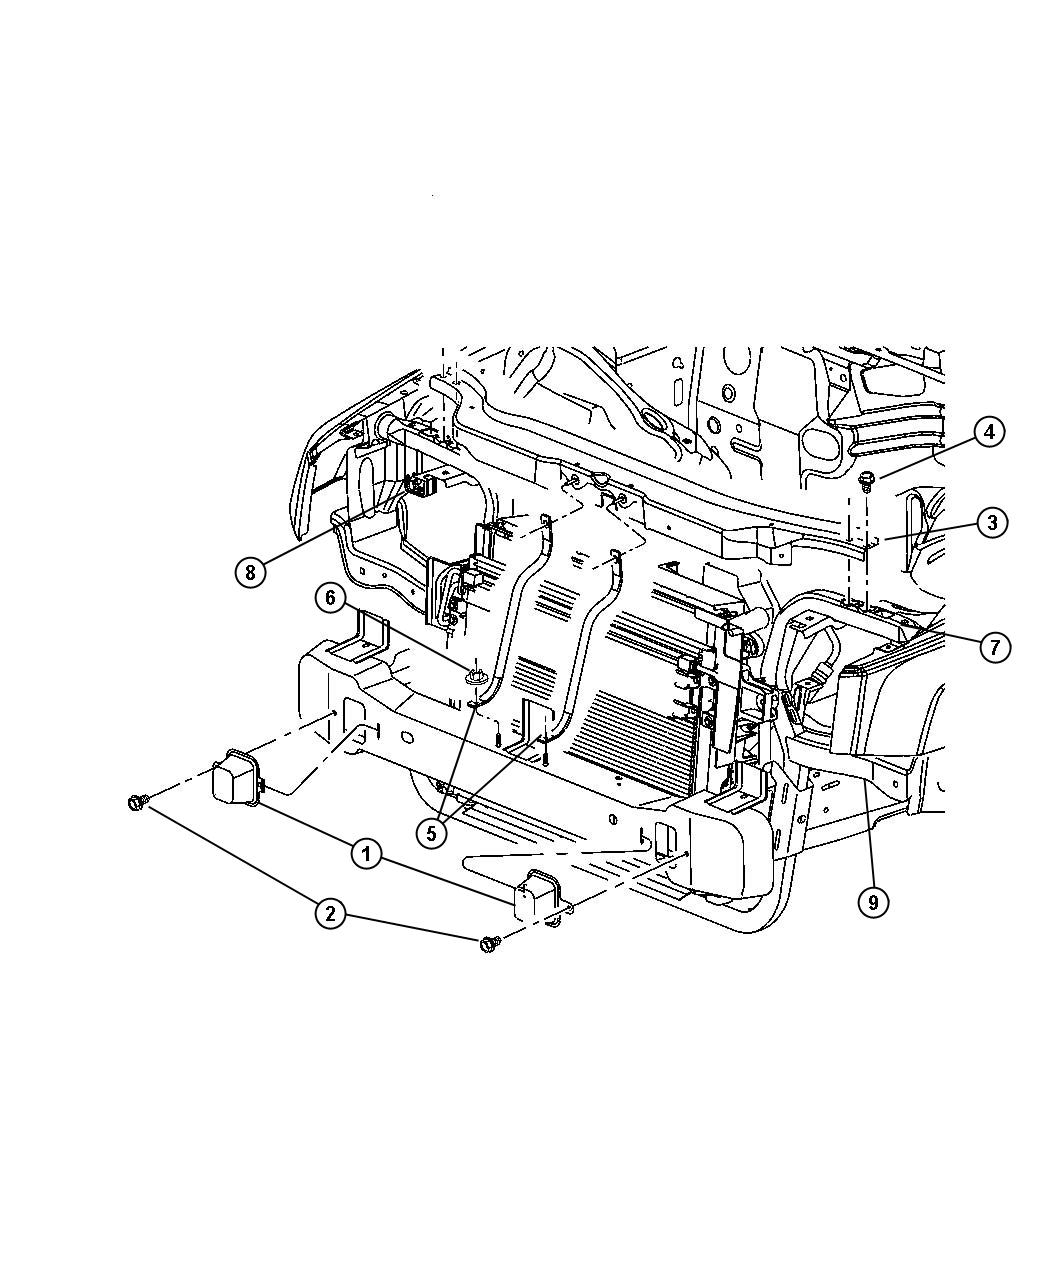 2006 Jeep Commander Oem Parts Diagram. Jeep. Auto Wiring